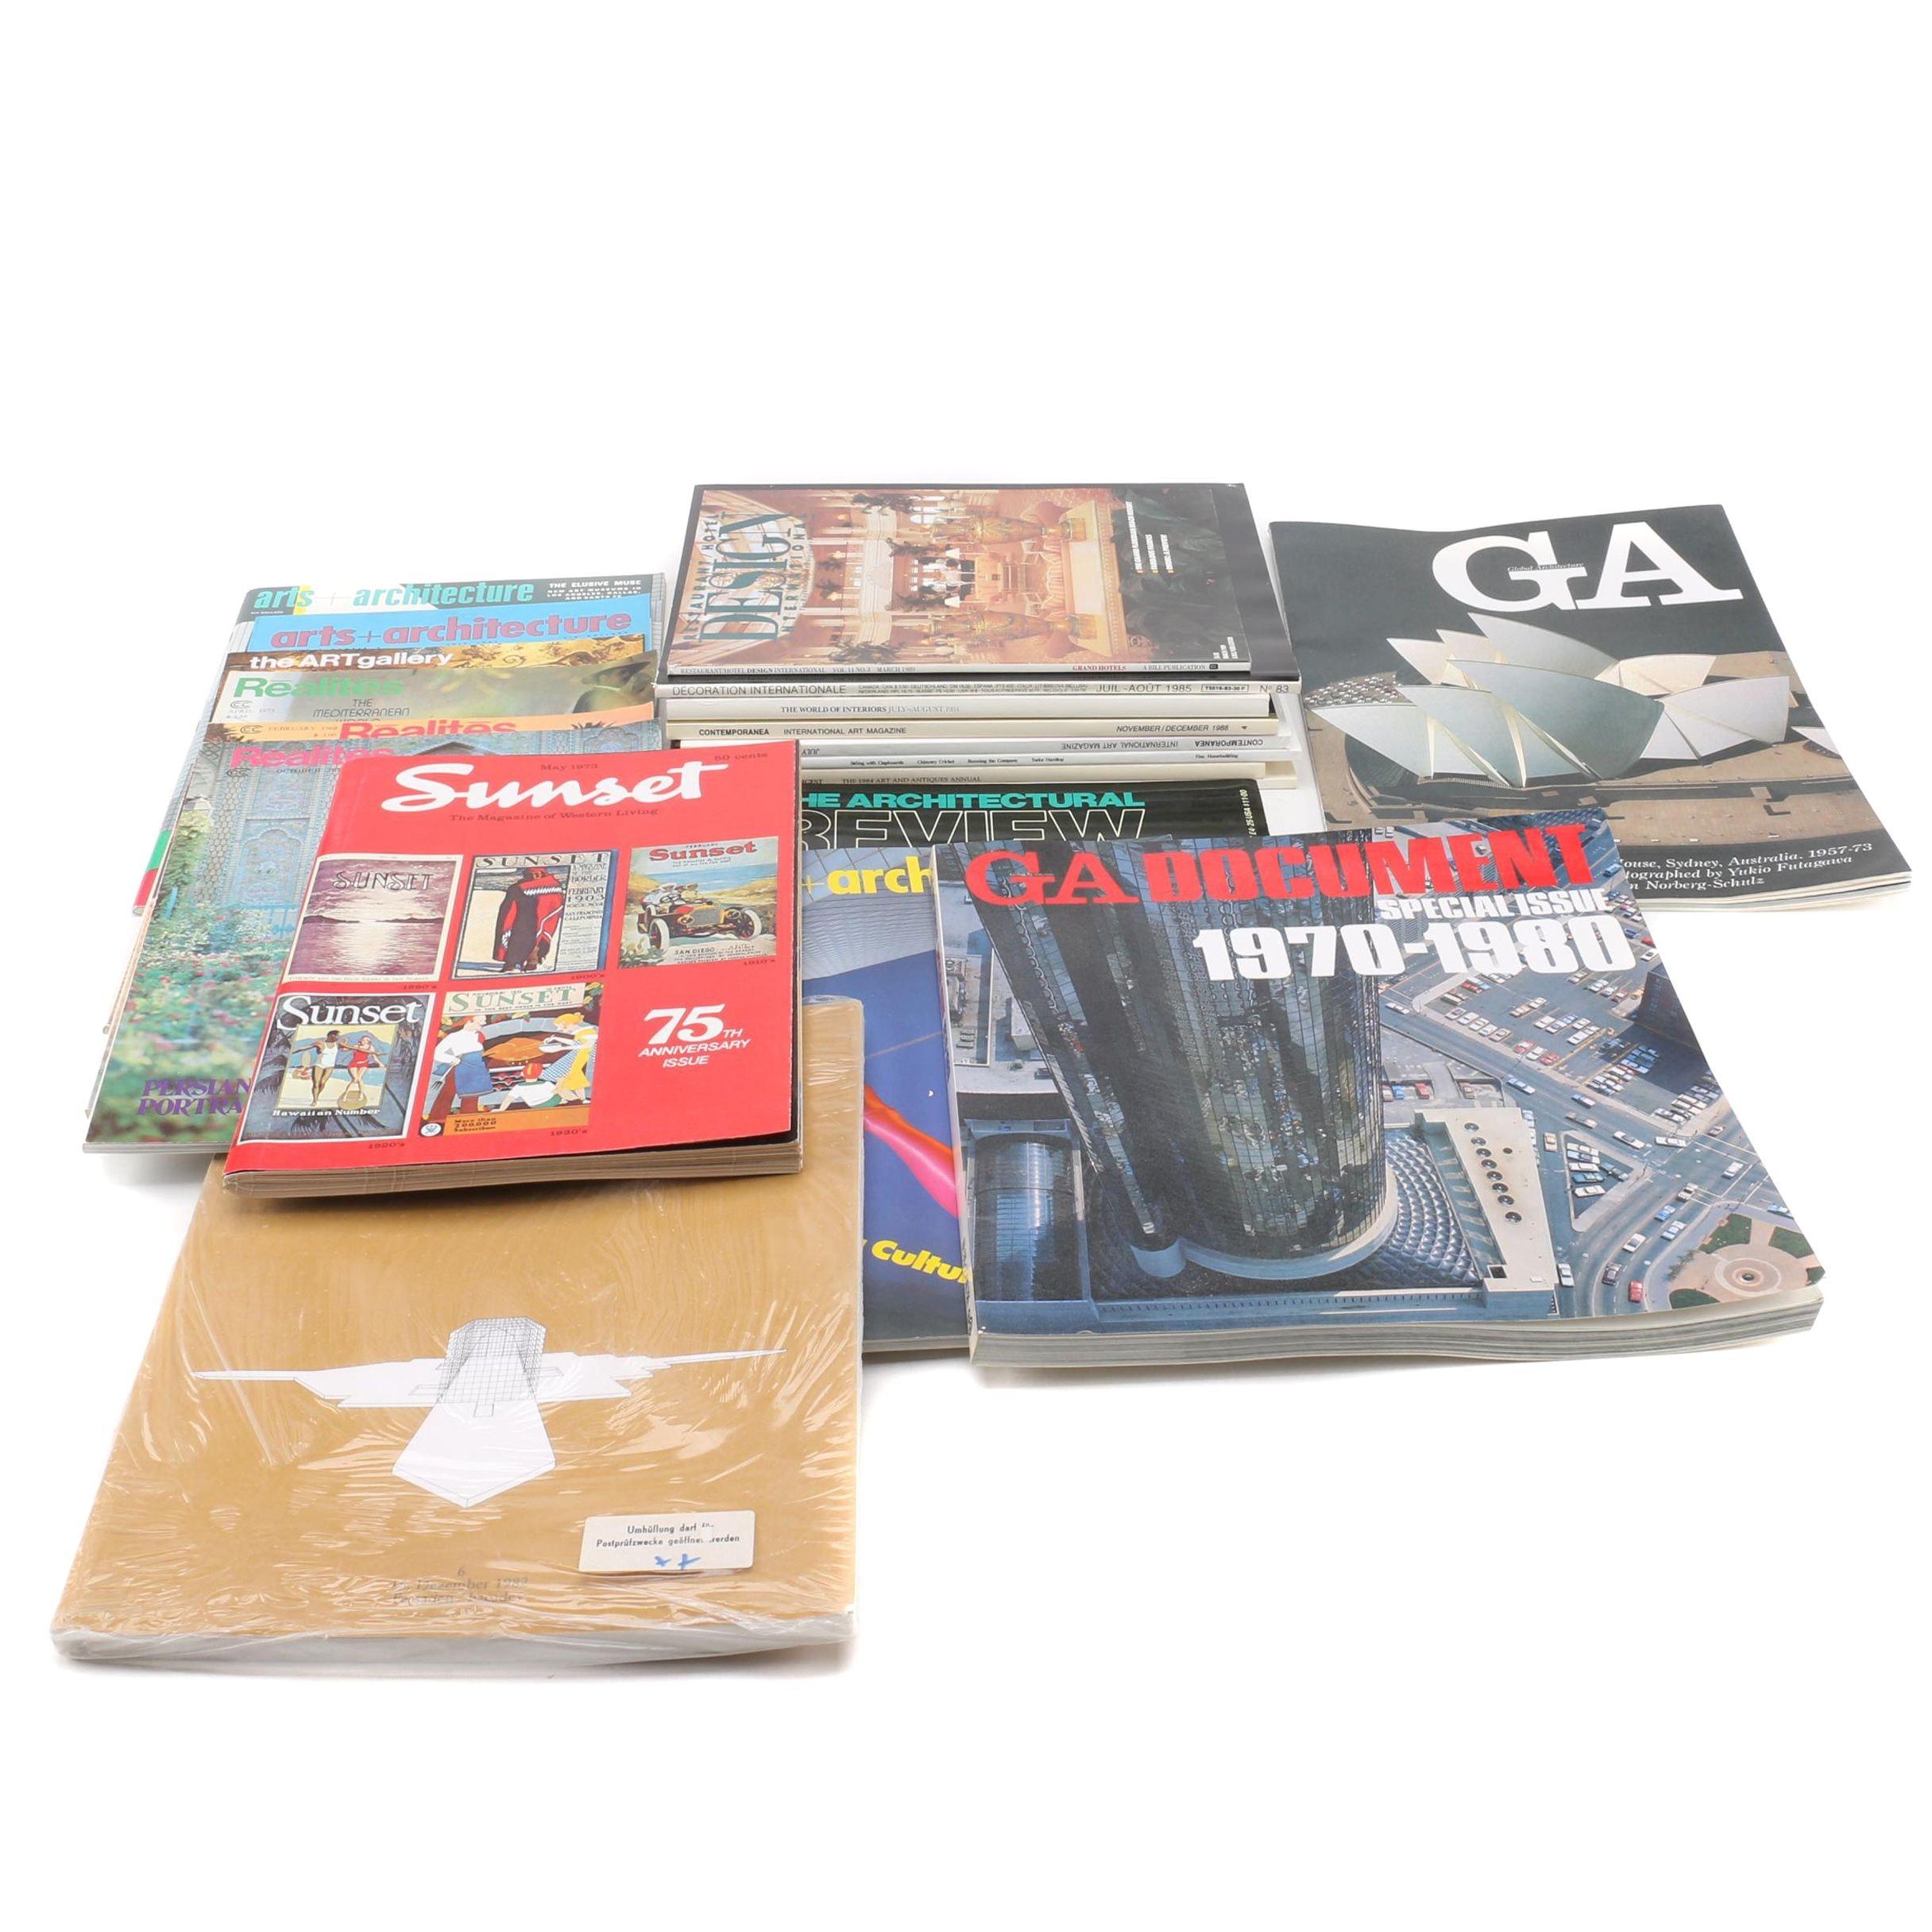 Architecture, Interior Design and More Magazines